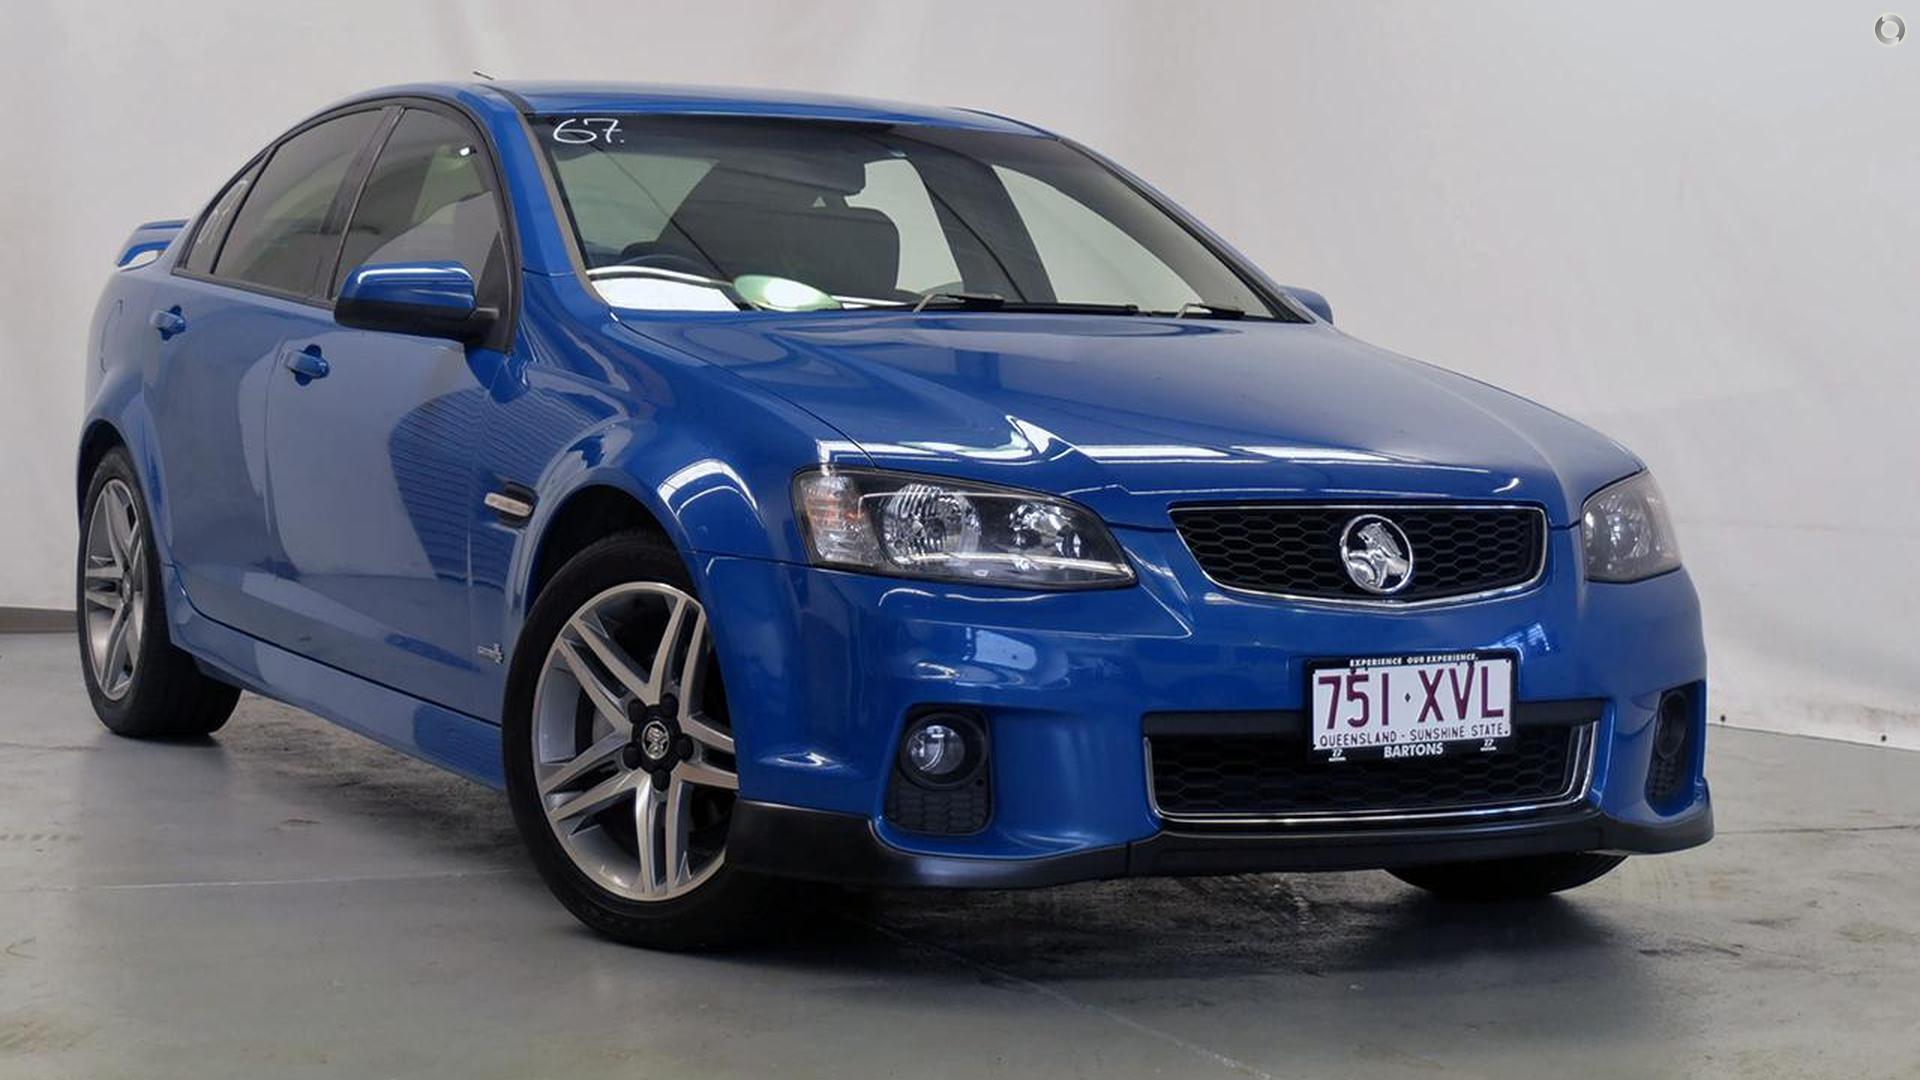 2012 Holden Commodore Sv6